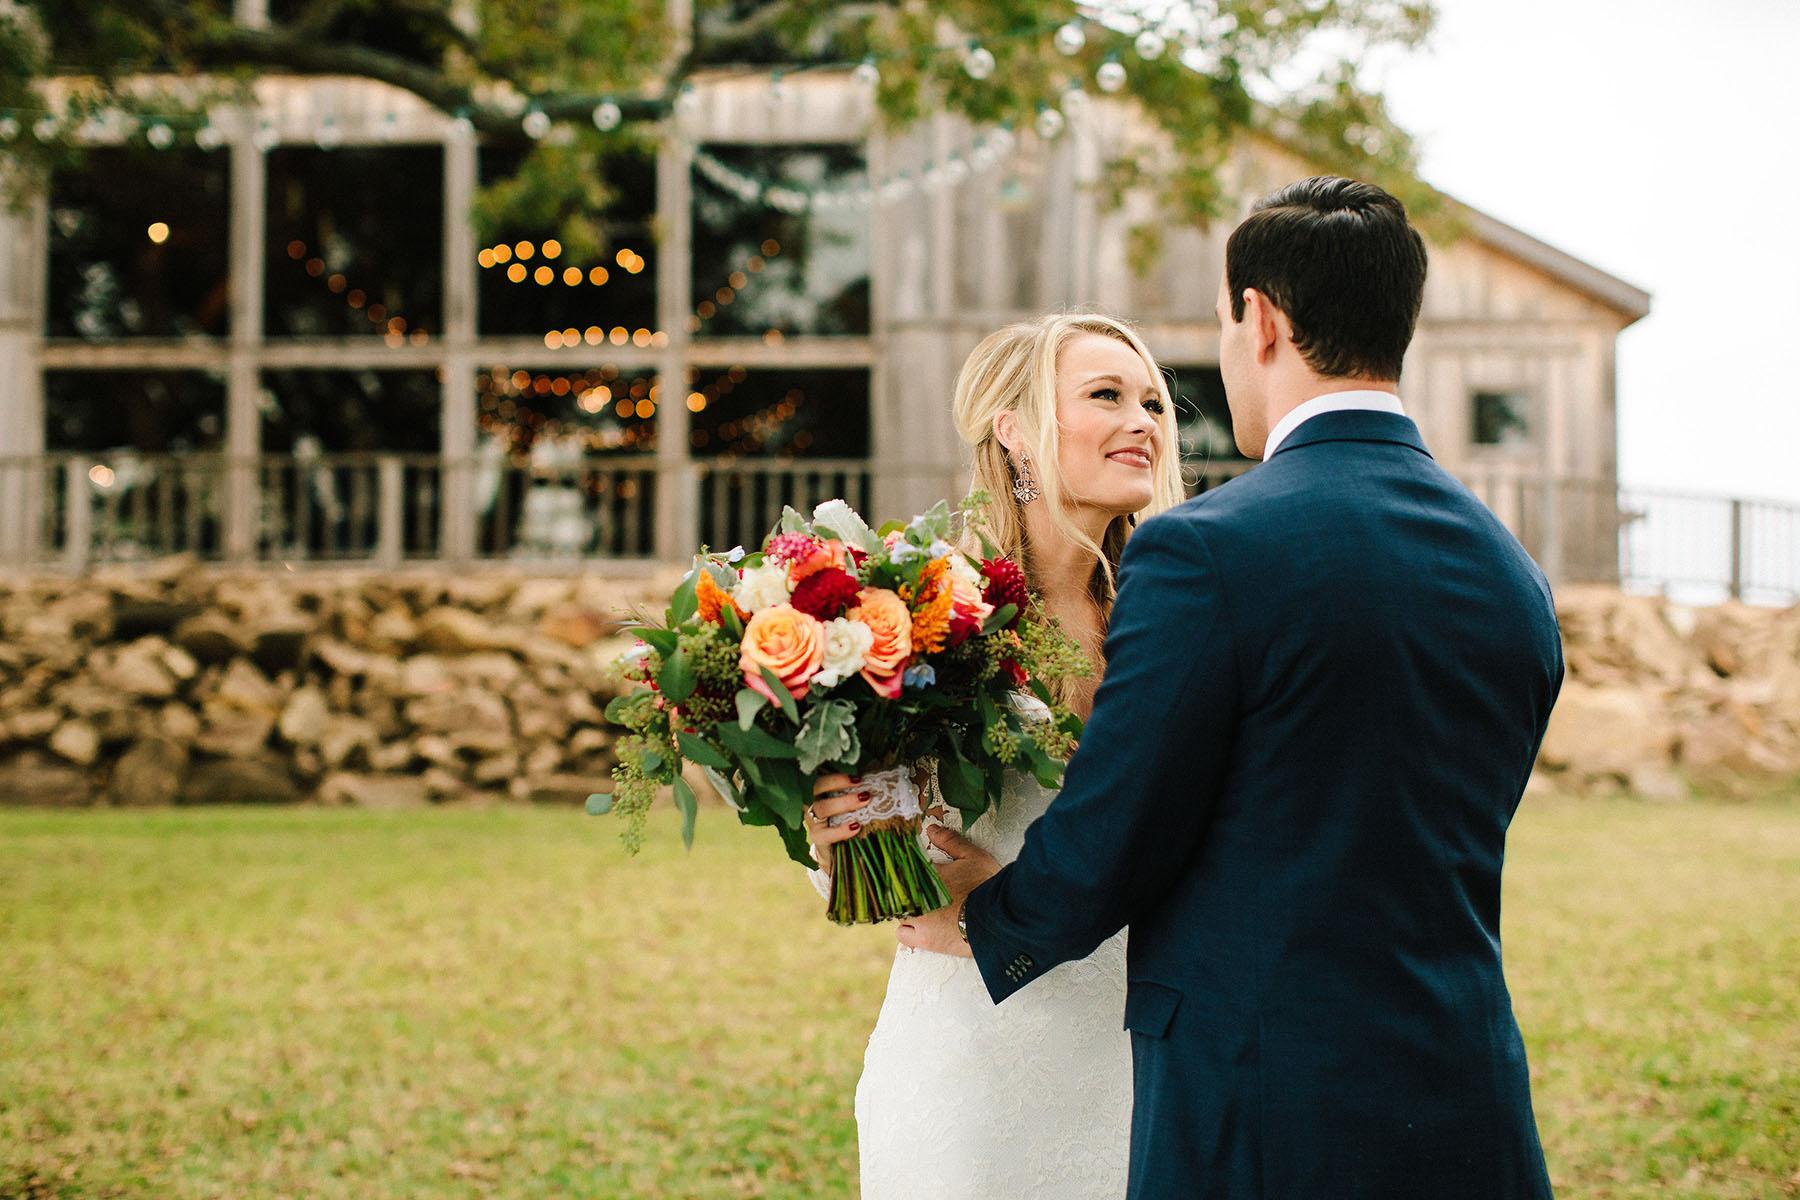 lauren_chad_wedding-55.jpg